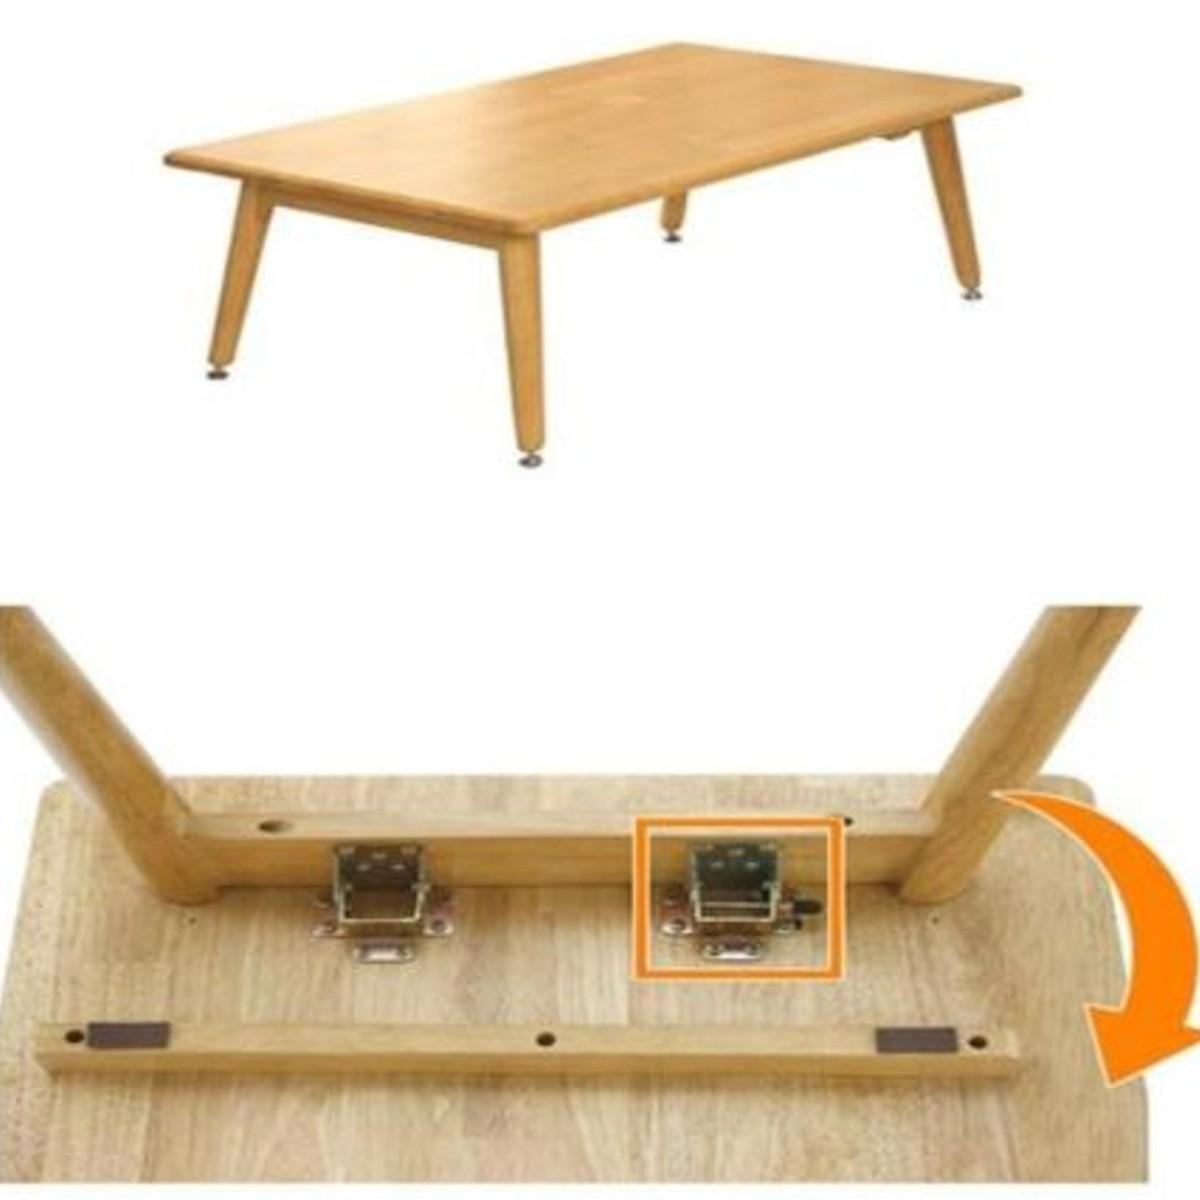 4pcs//Set Iron Locking Folding Bracket Folding Table Leg Hinges 75 x 60 x 55mm